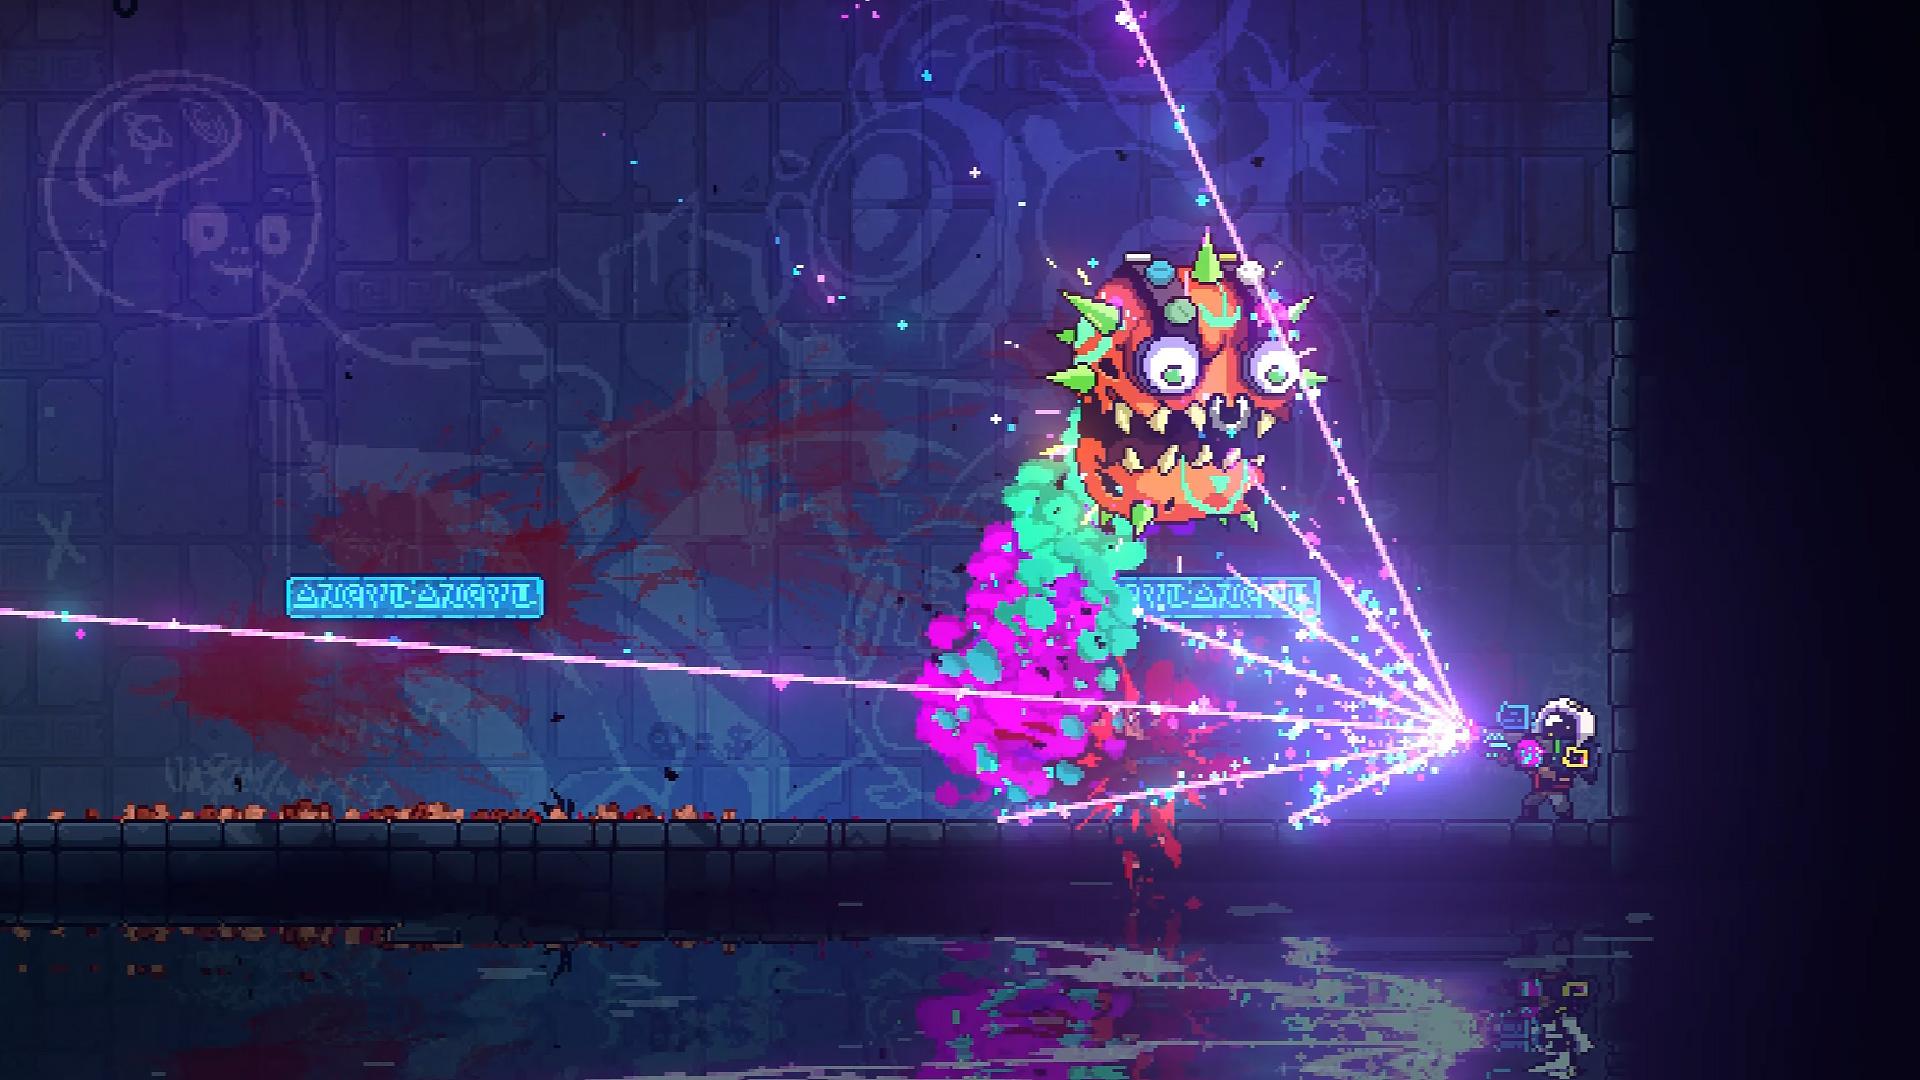 Neon Abyss Screenshots Image 26598 Xboxone Hq Com